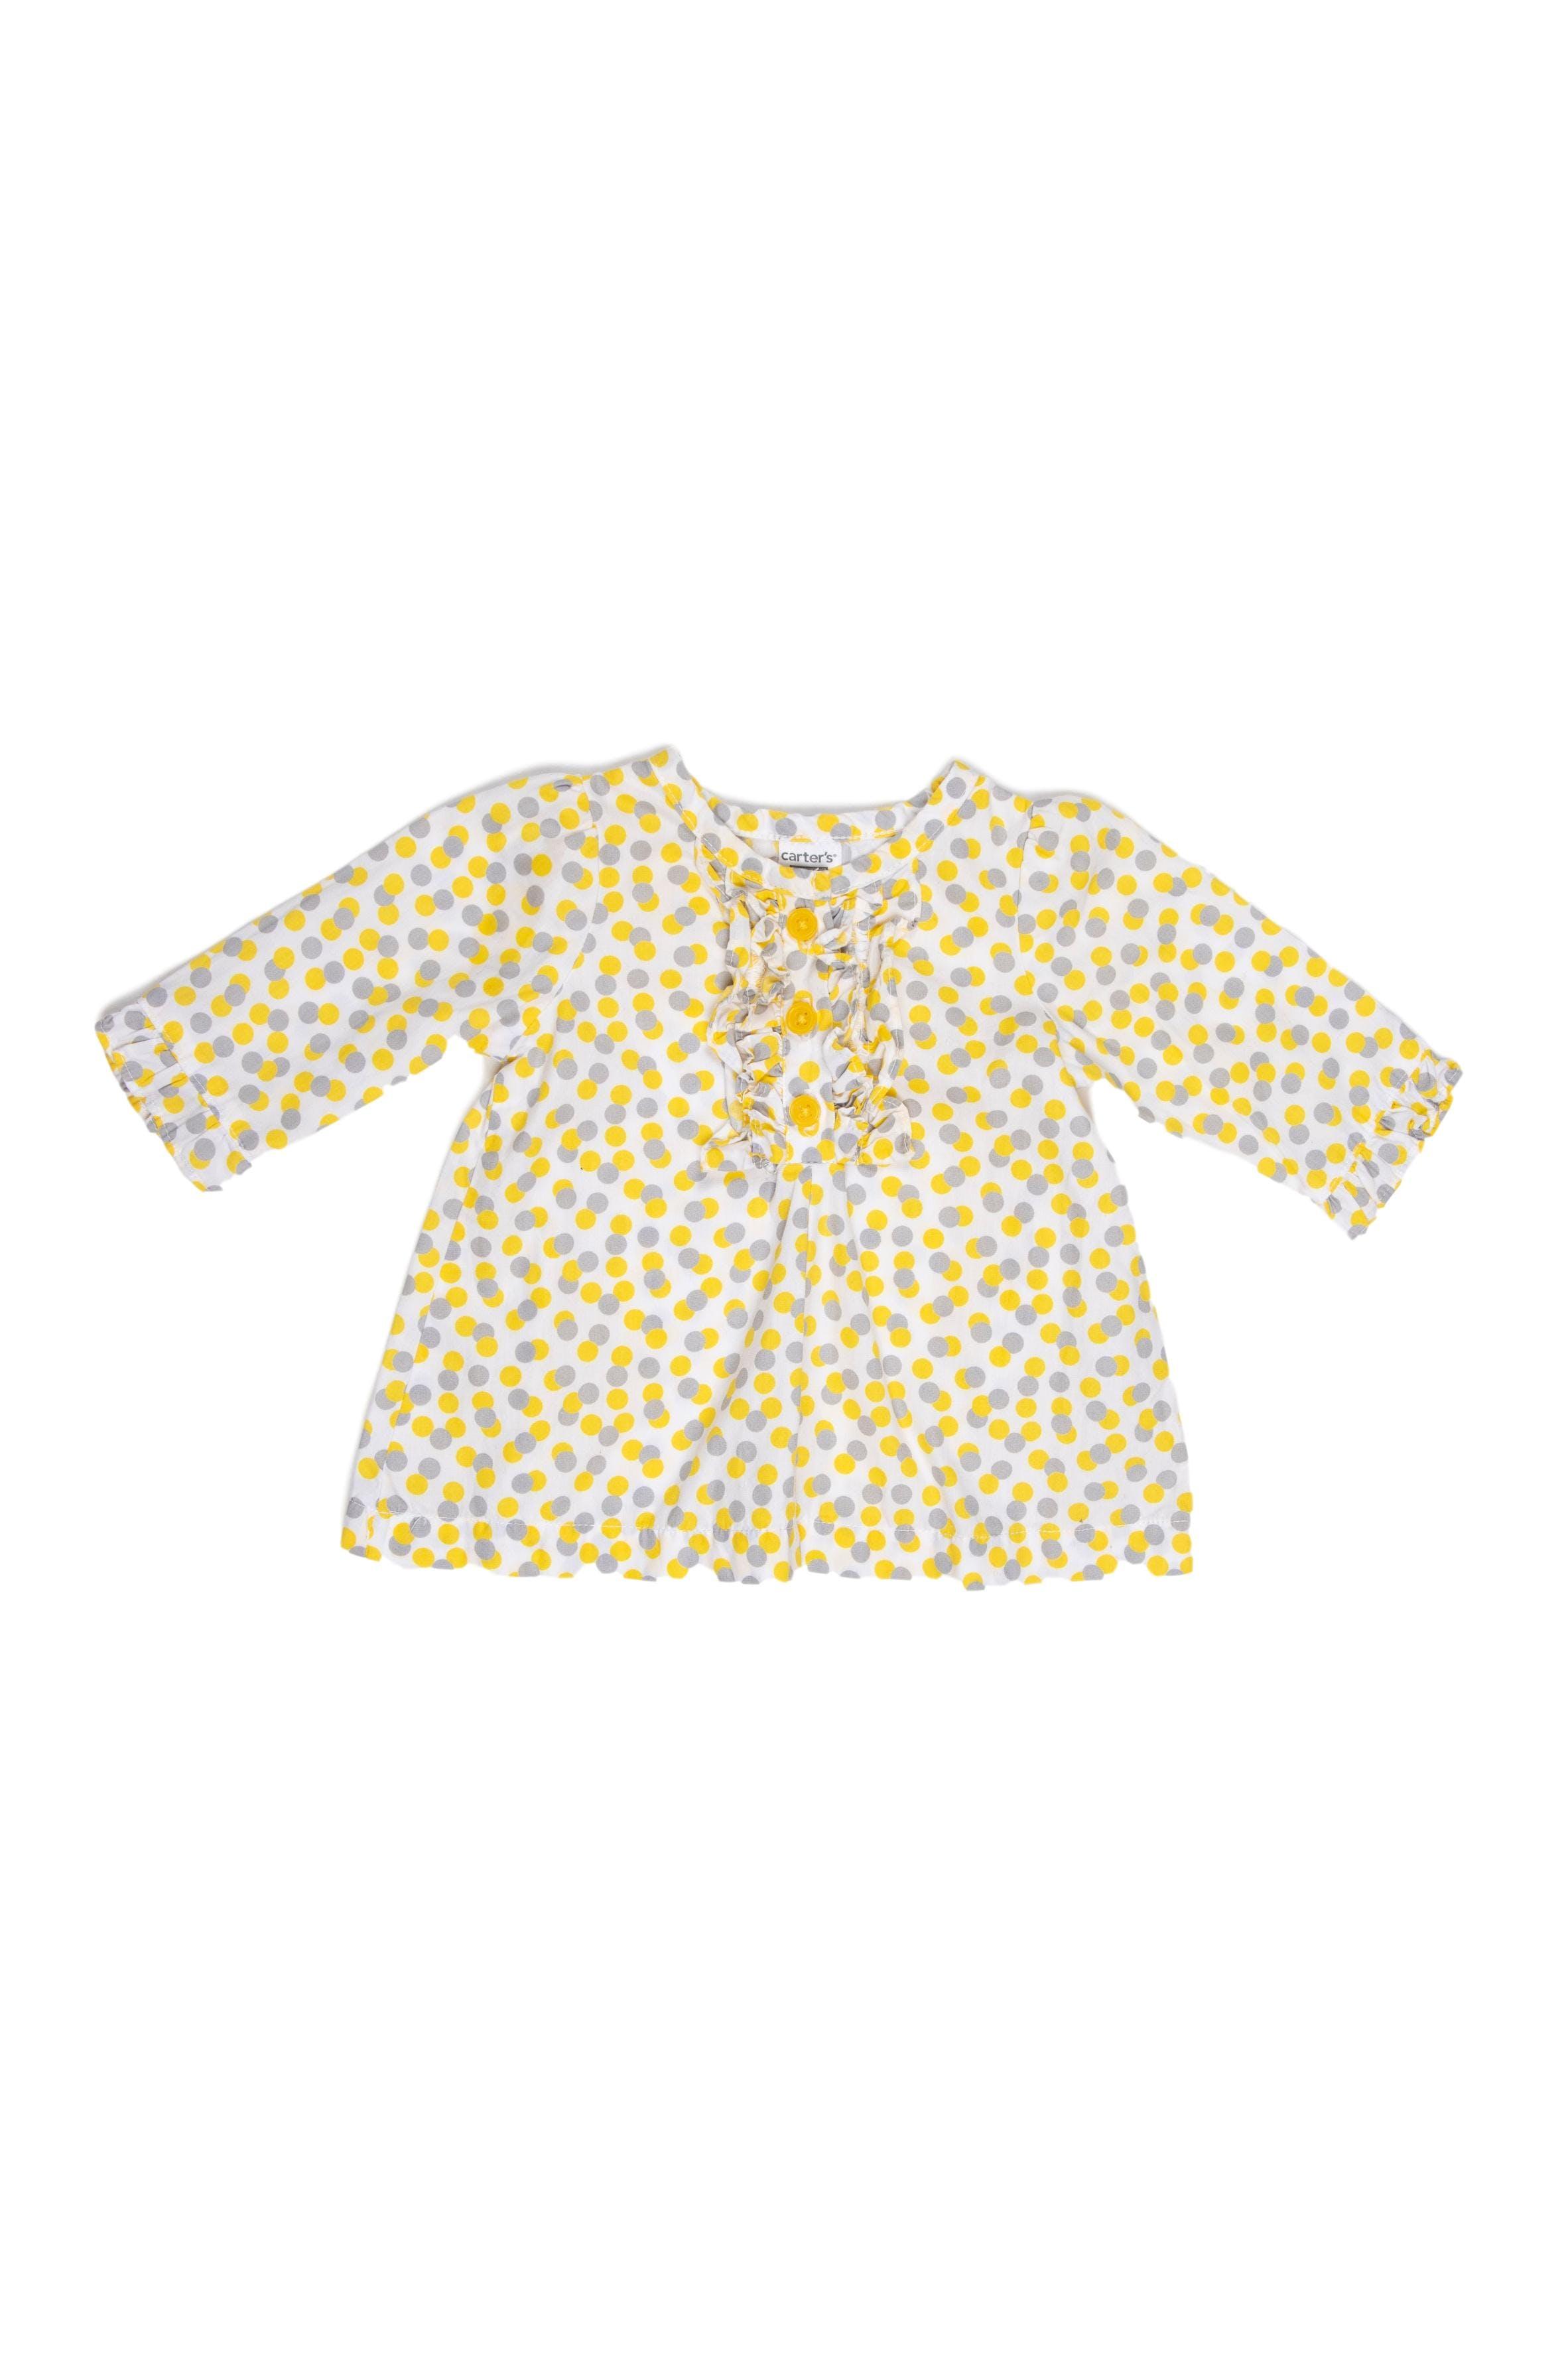 Blusa amarilla con puntos grises 100% algodón - Carter's